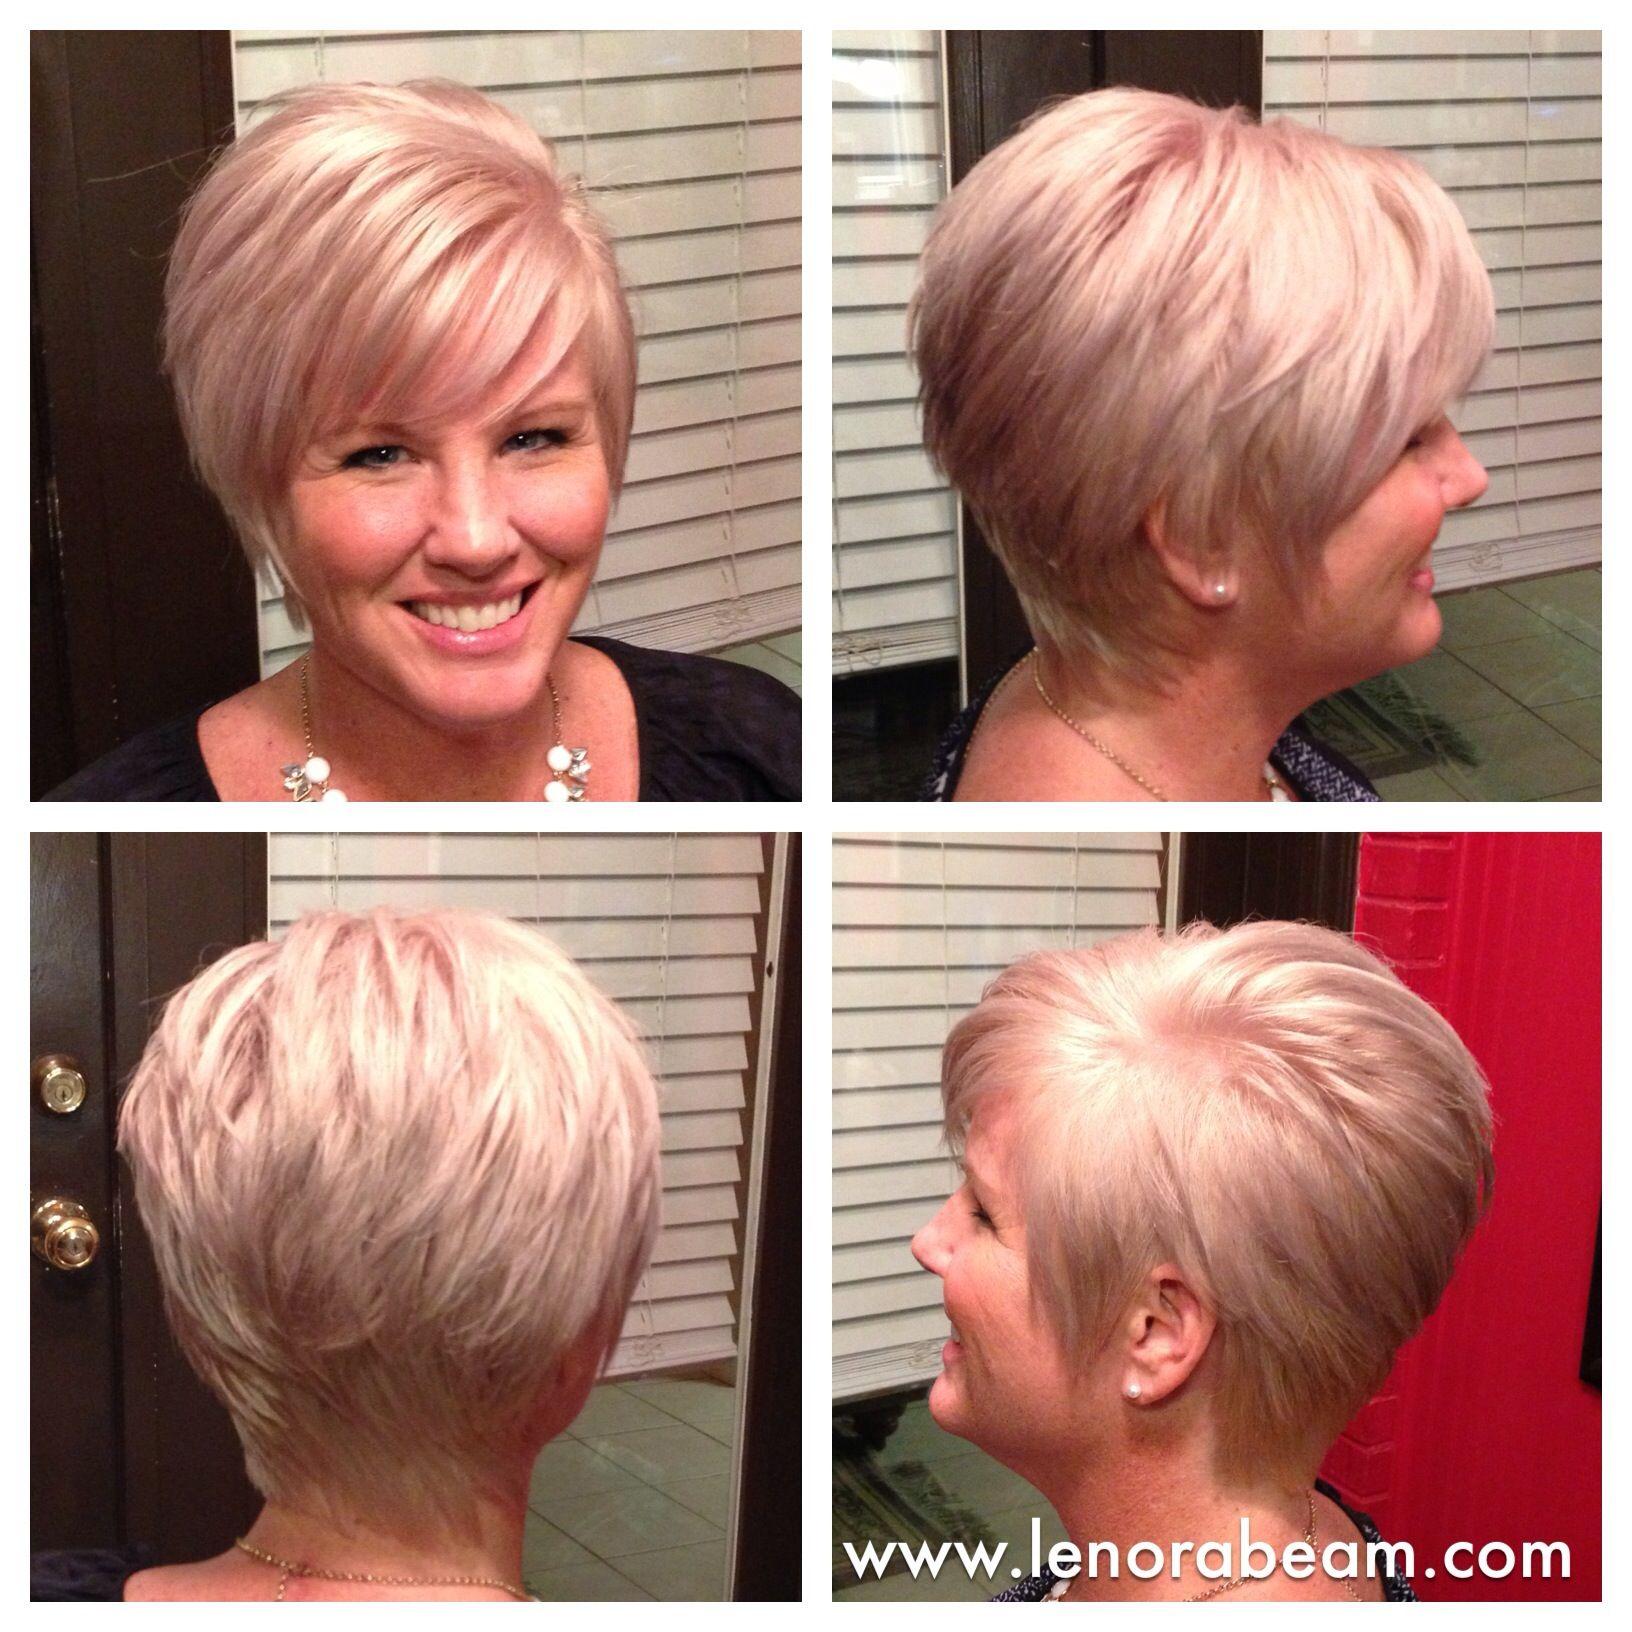 Platinum blonde hair styles pinterest colors feminine and style